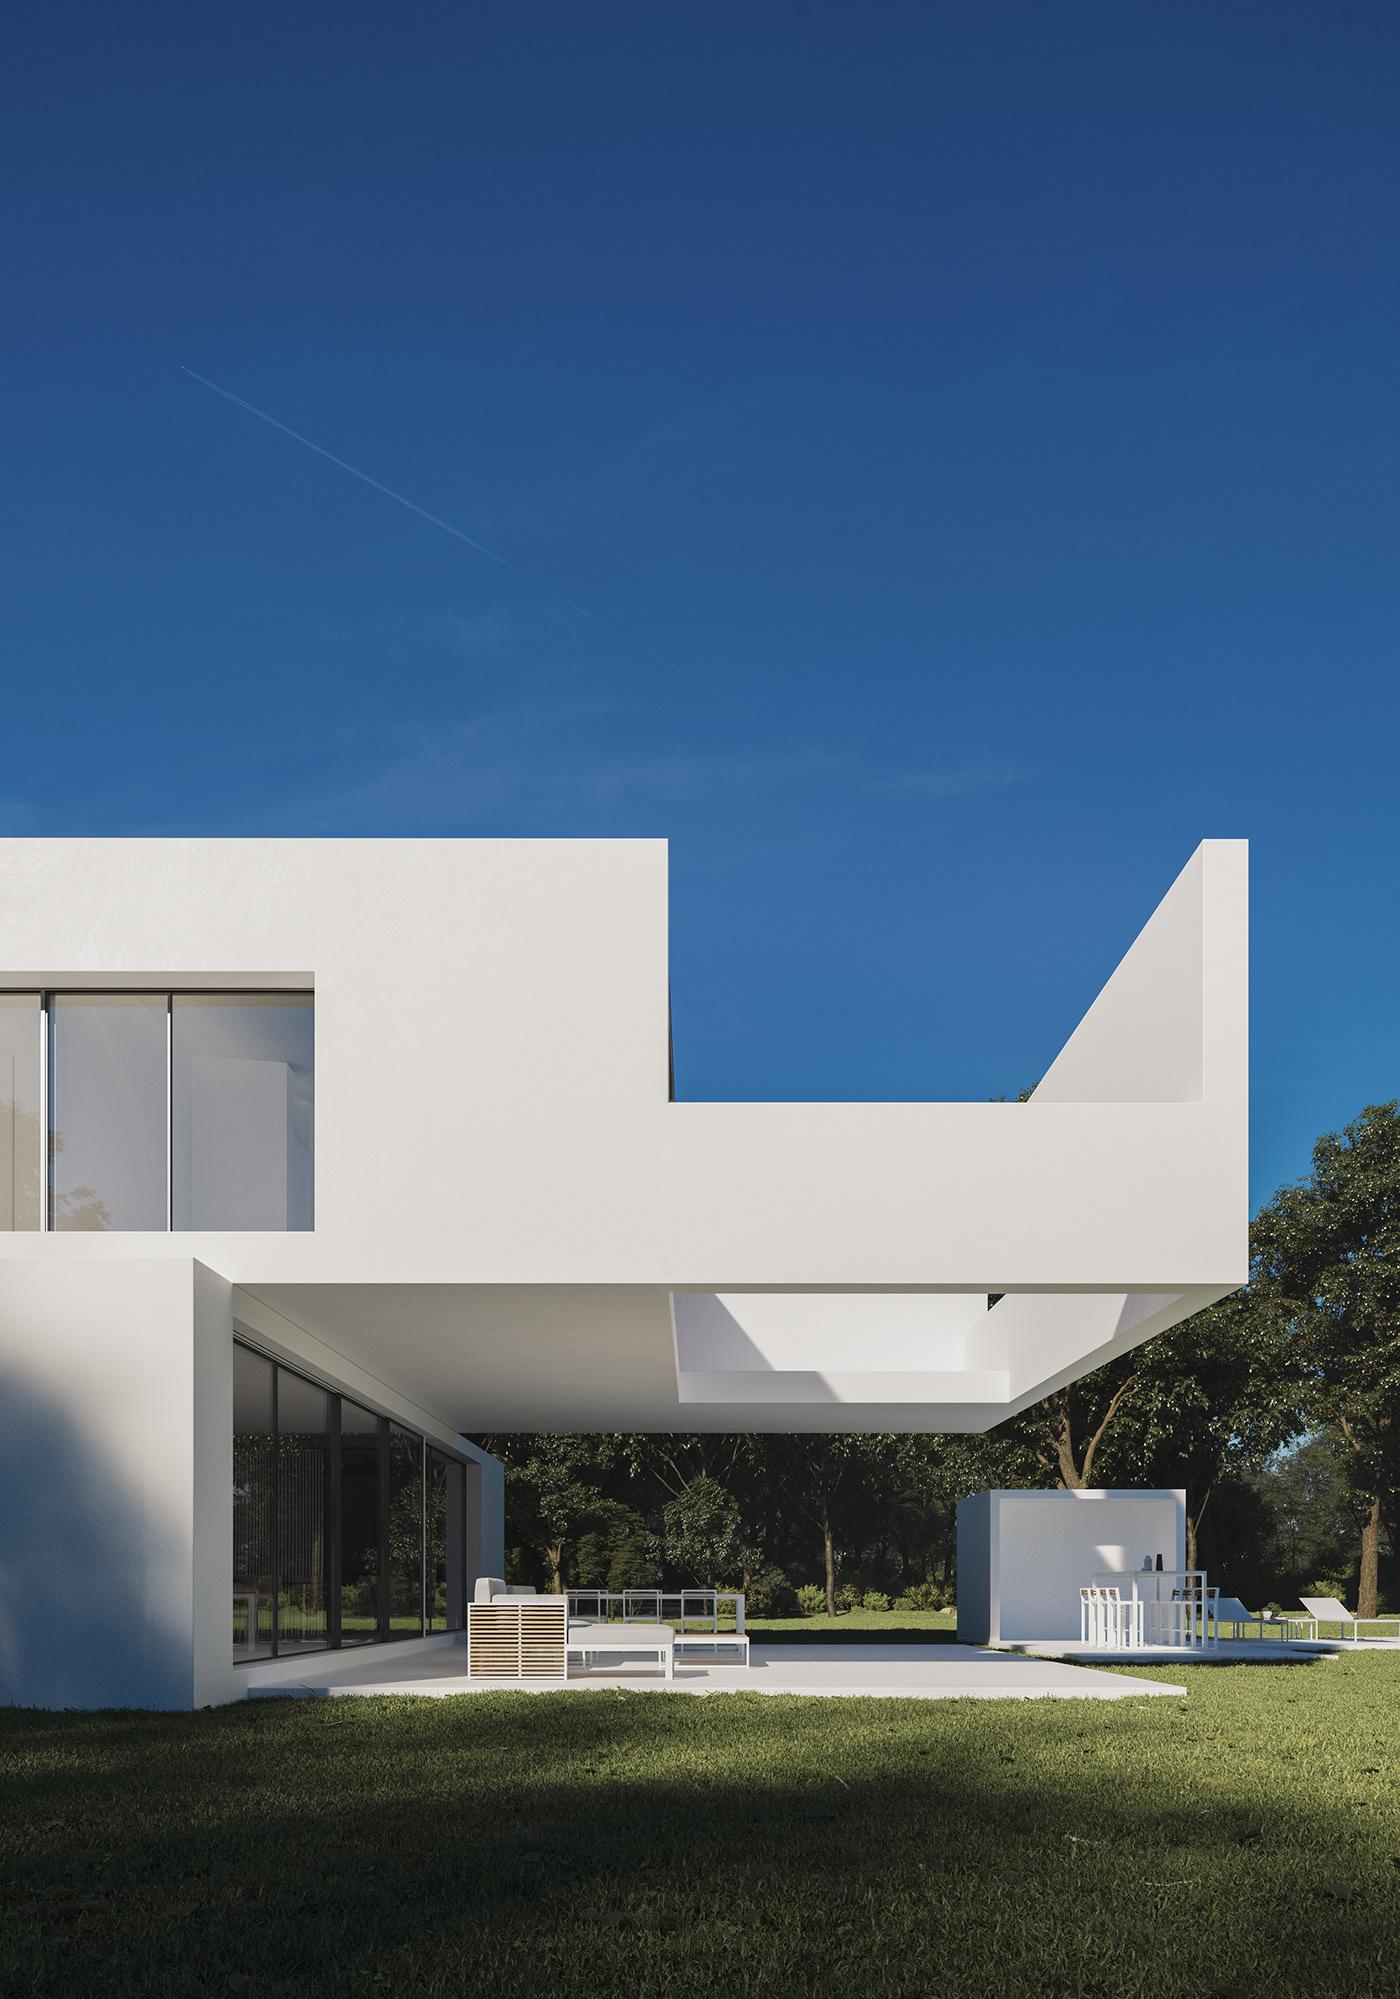 3D architecture archviz CGI design Minimalism Render visualization